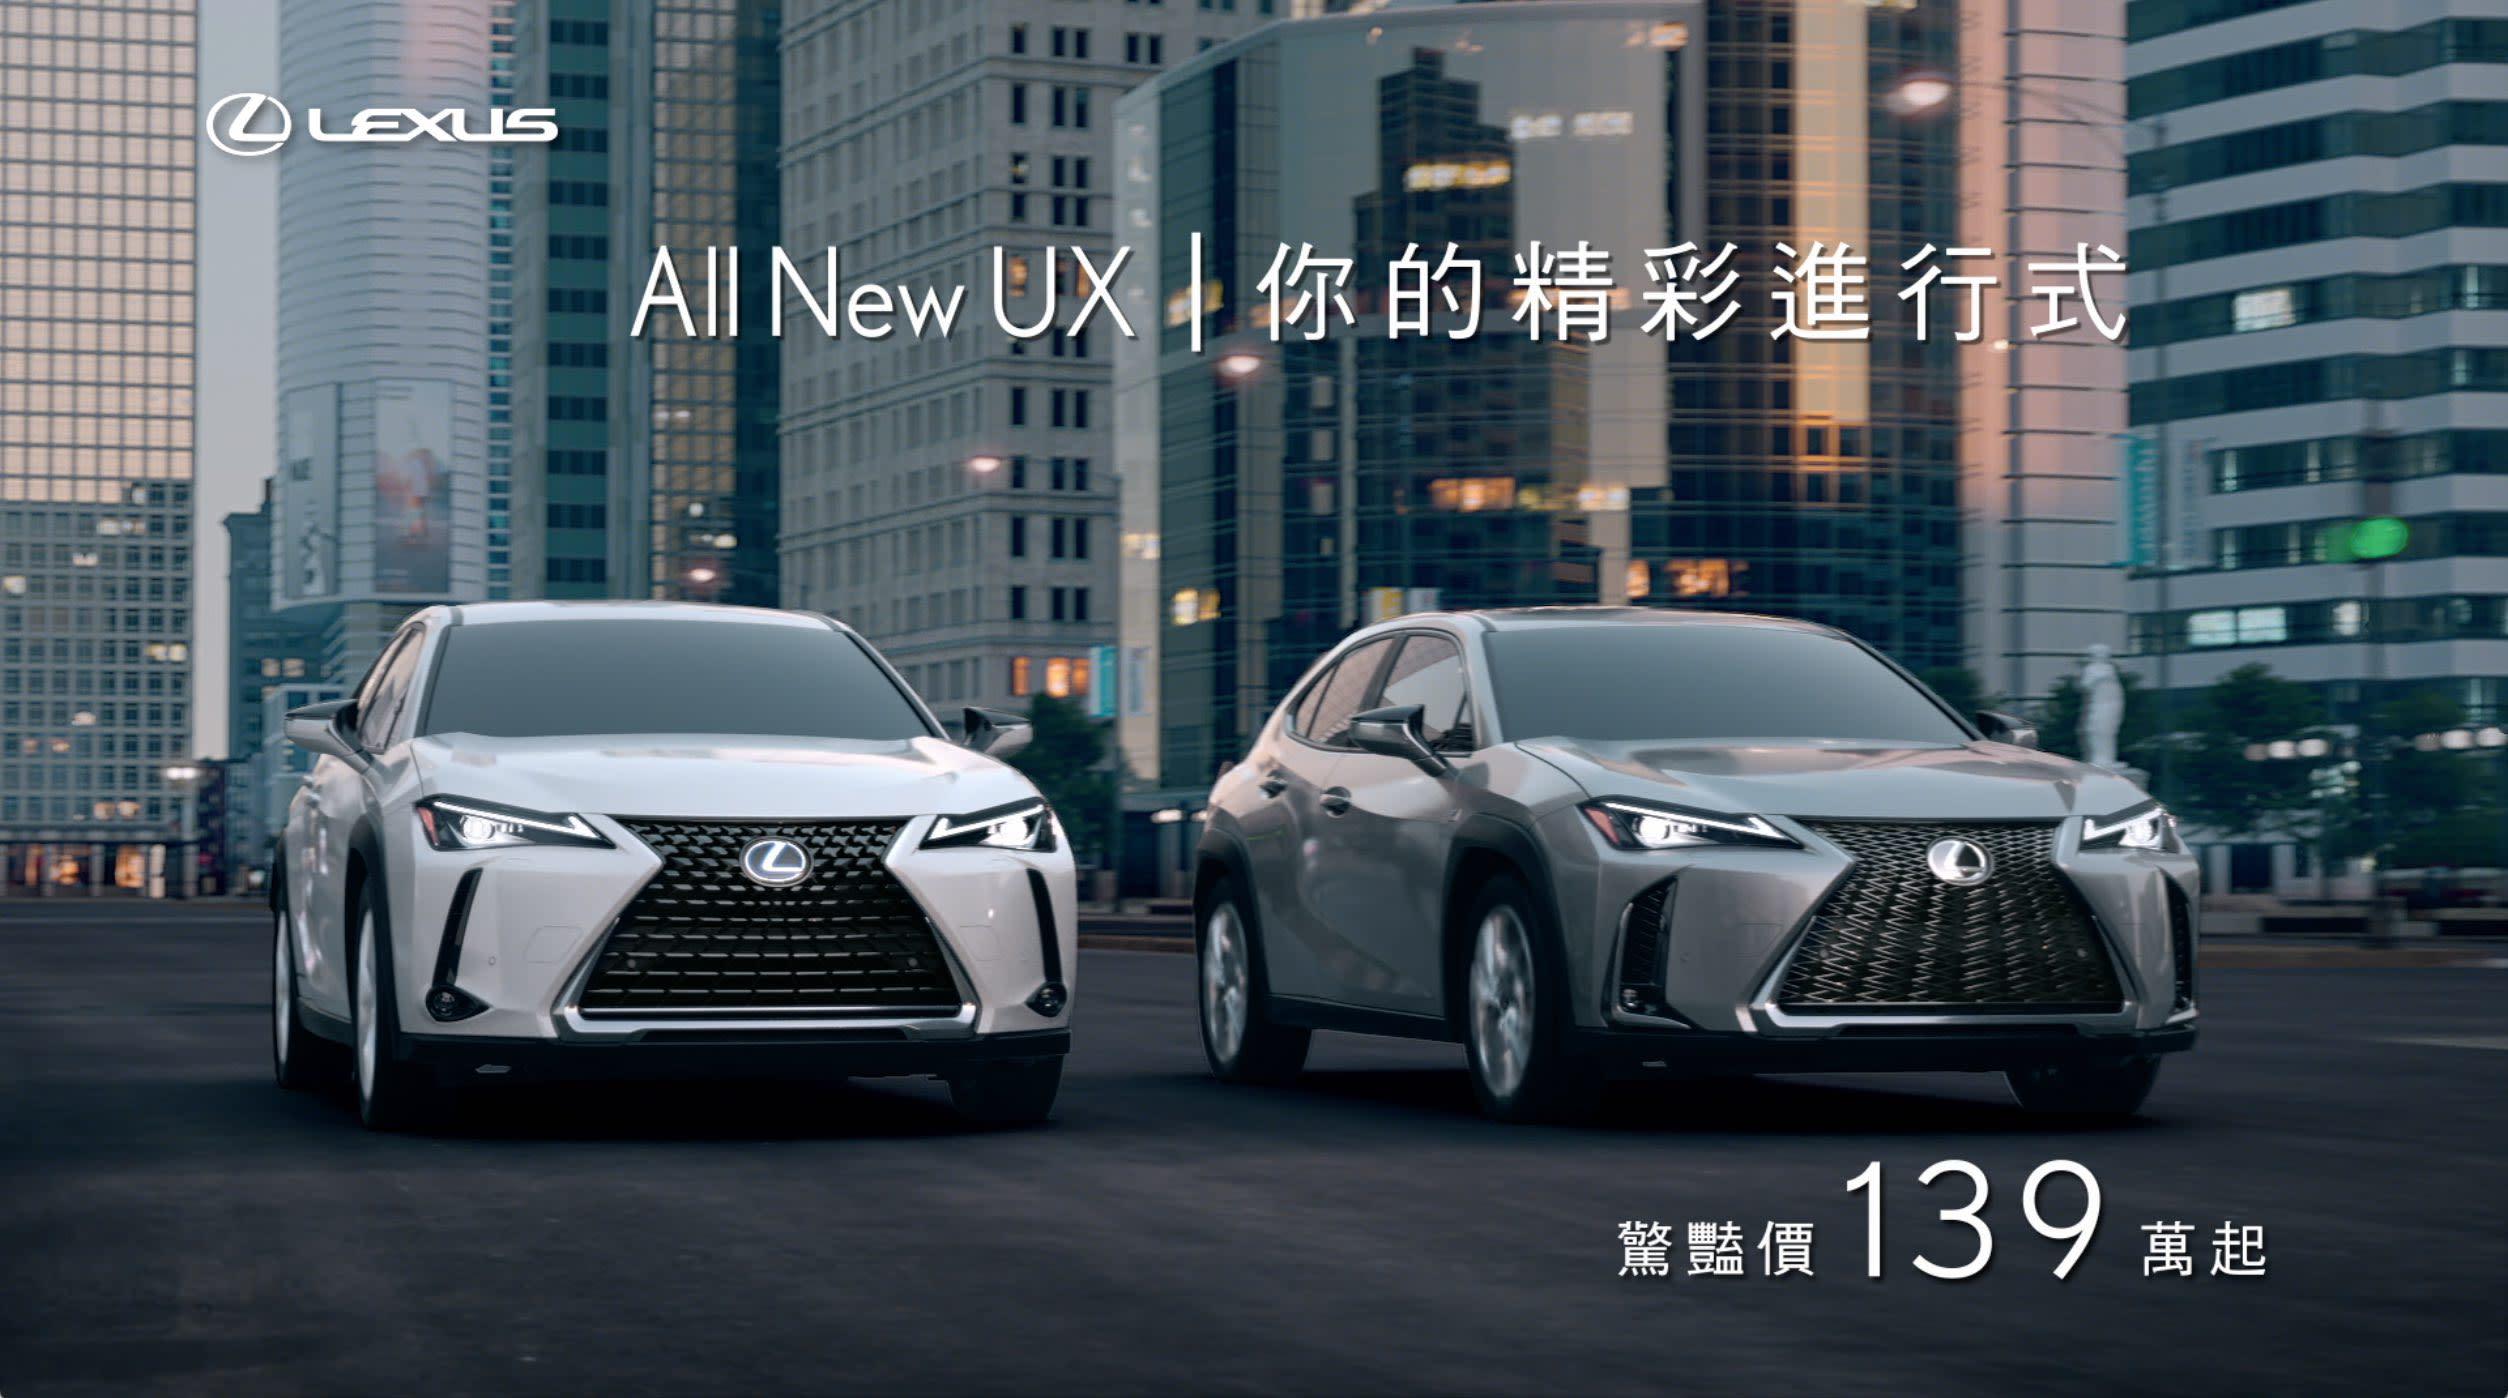 LEXUS All New UX 你的精彩進行式